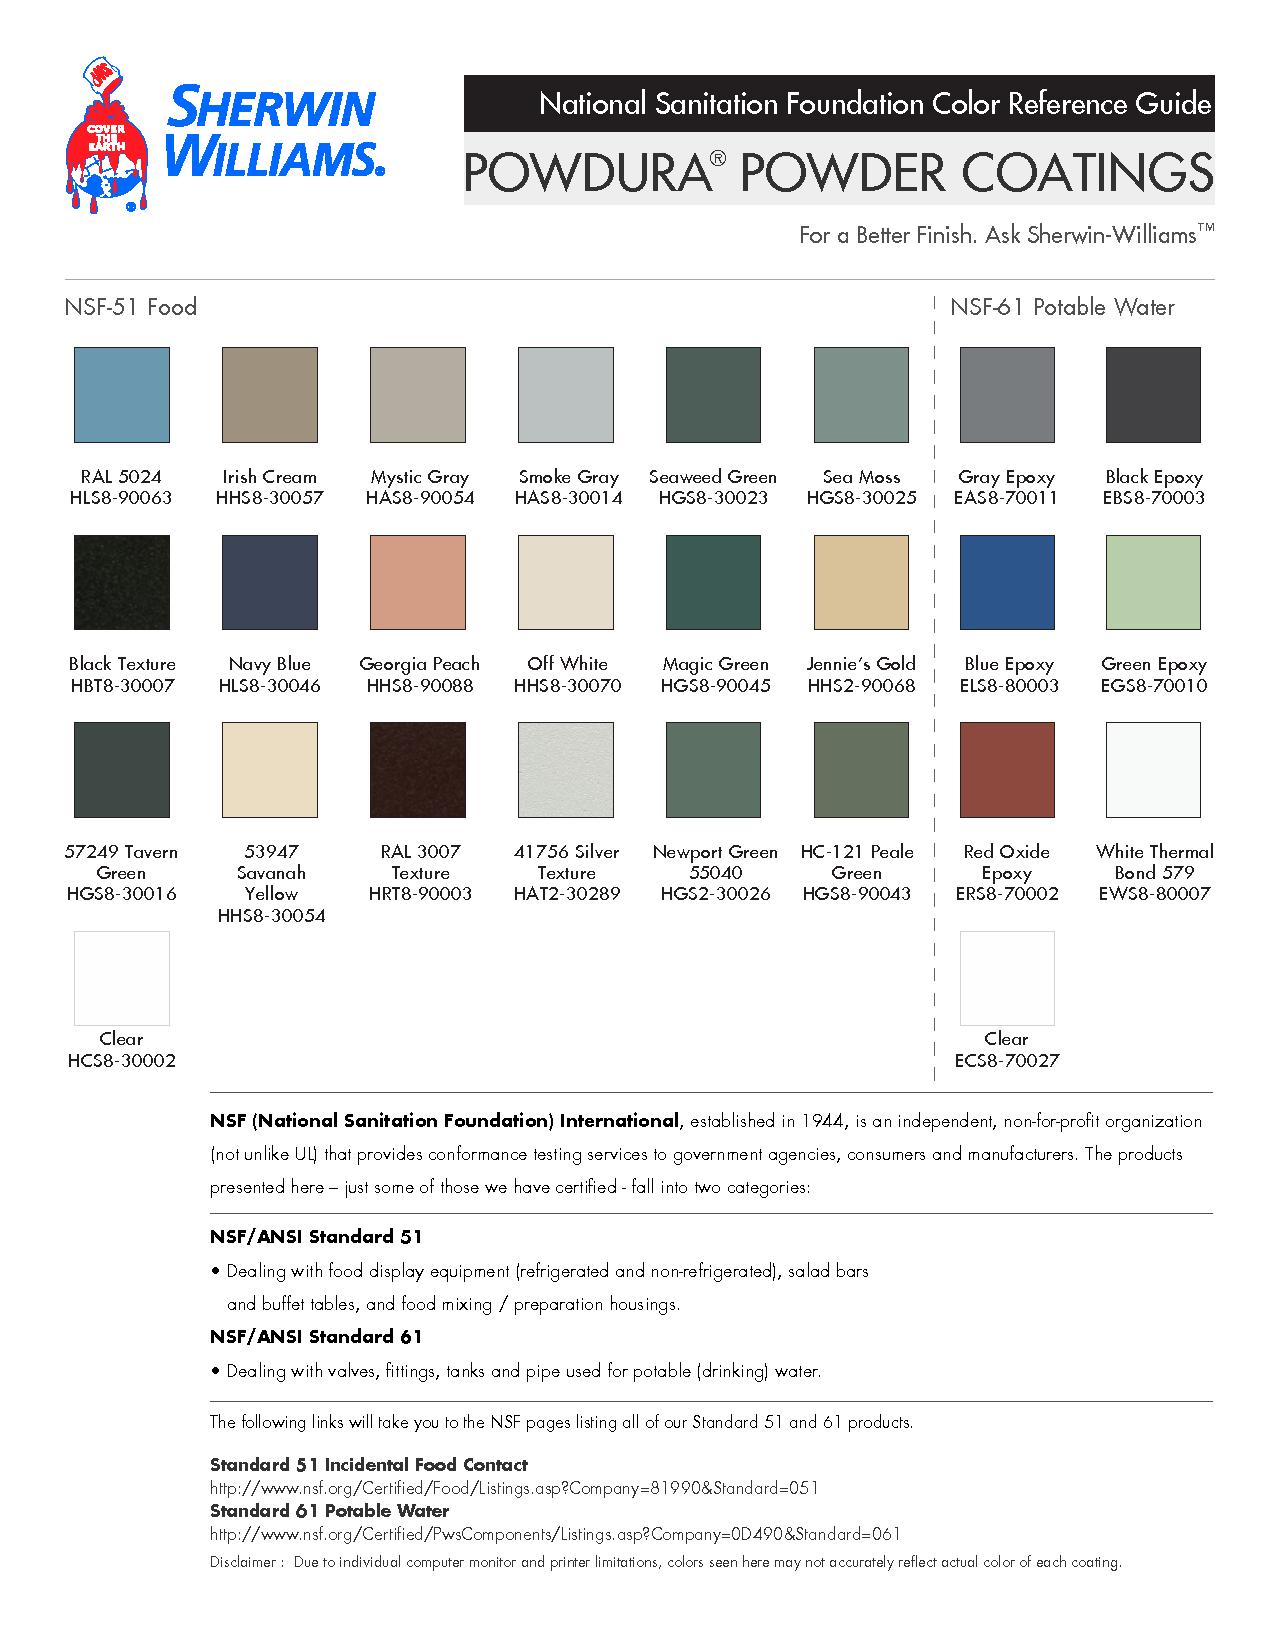 sherwin williams powder coat colors 2015   Grasscloth Wallpaper 1275x1650